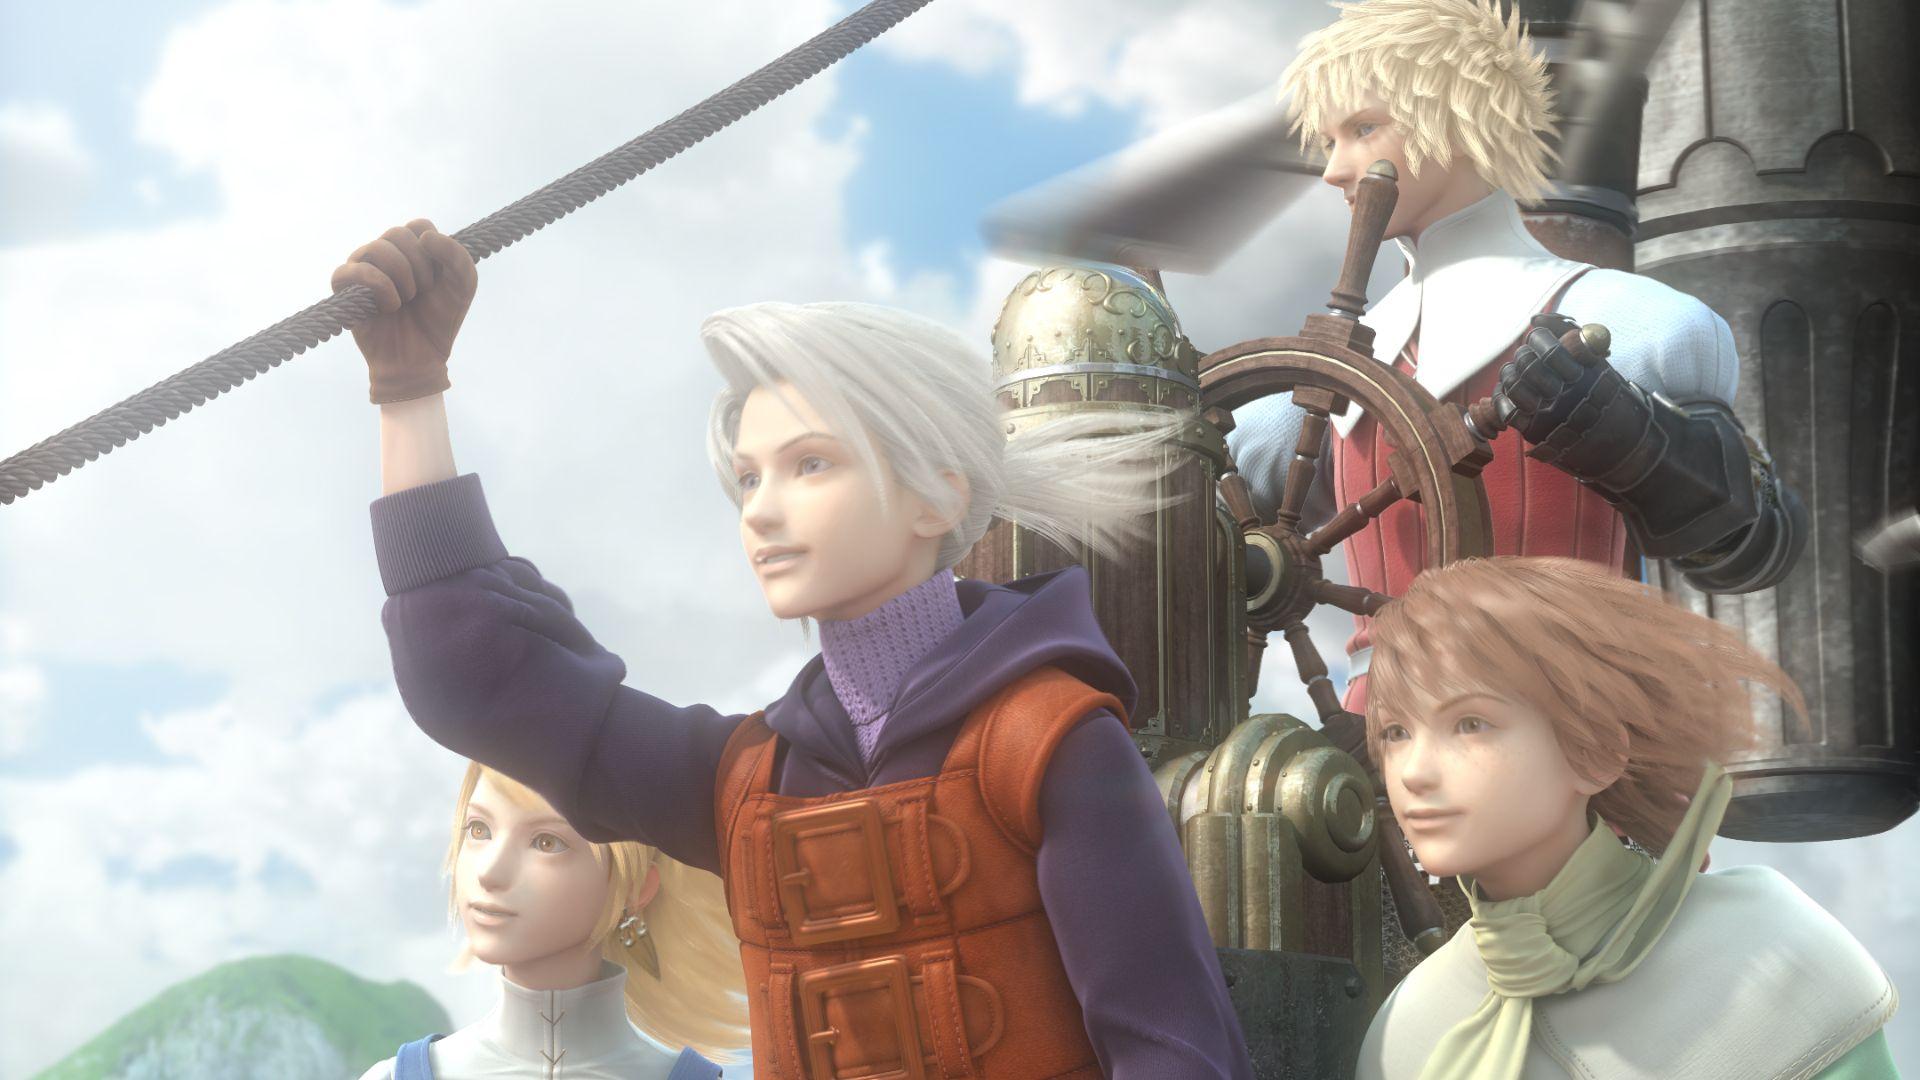 Final Fantasy Iii Refia Luneth Arc Ingus Kartinki